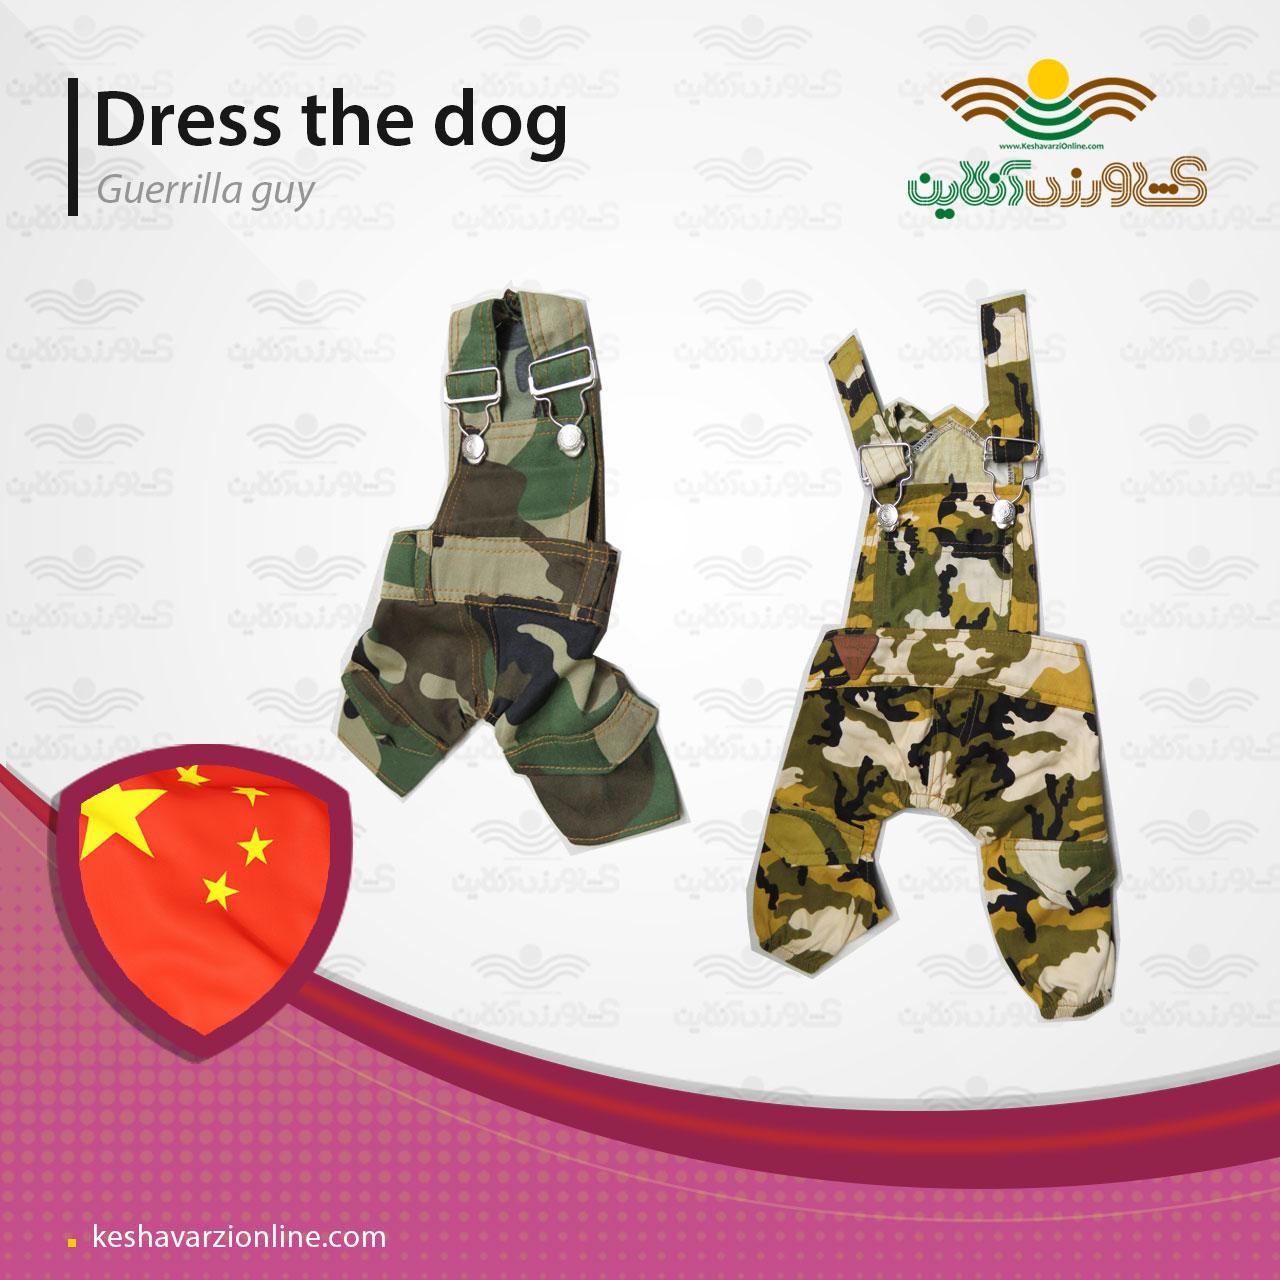 لباس سگ پسرانه چریکی